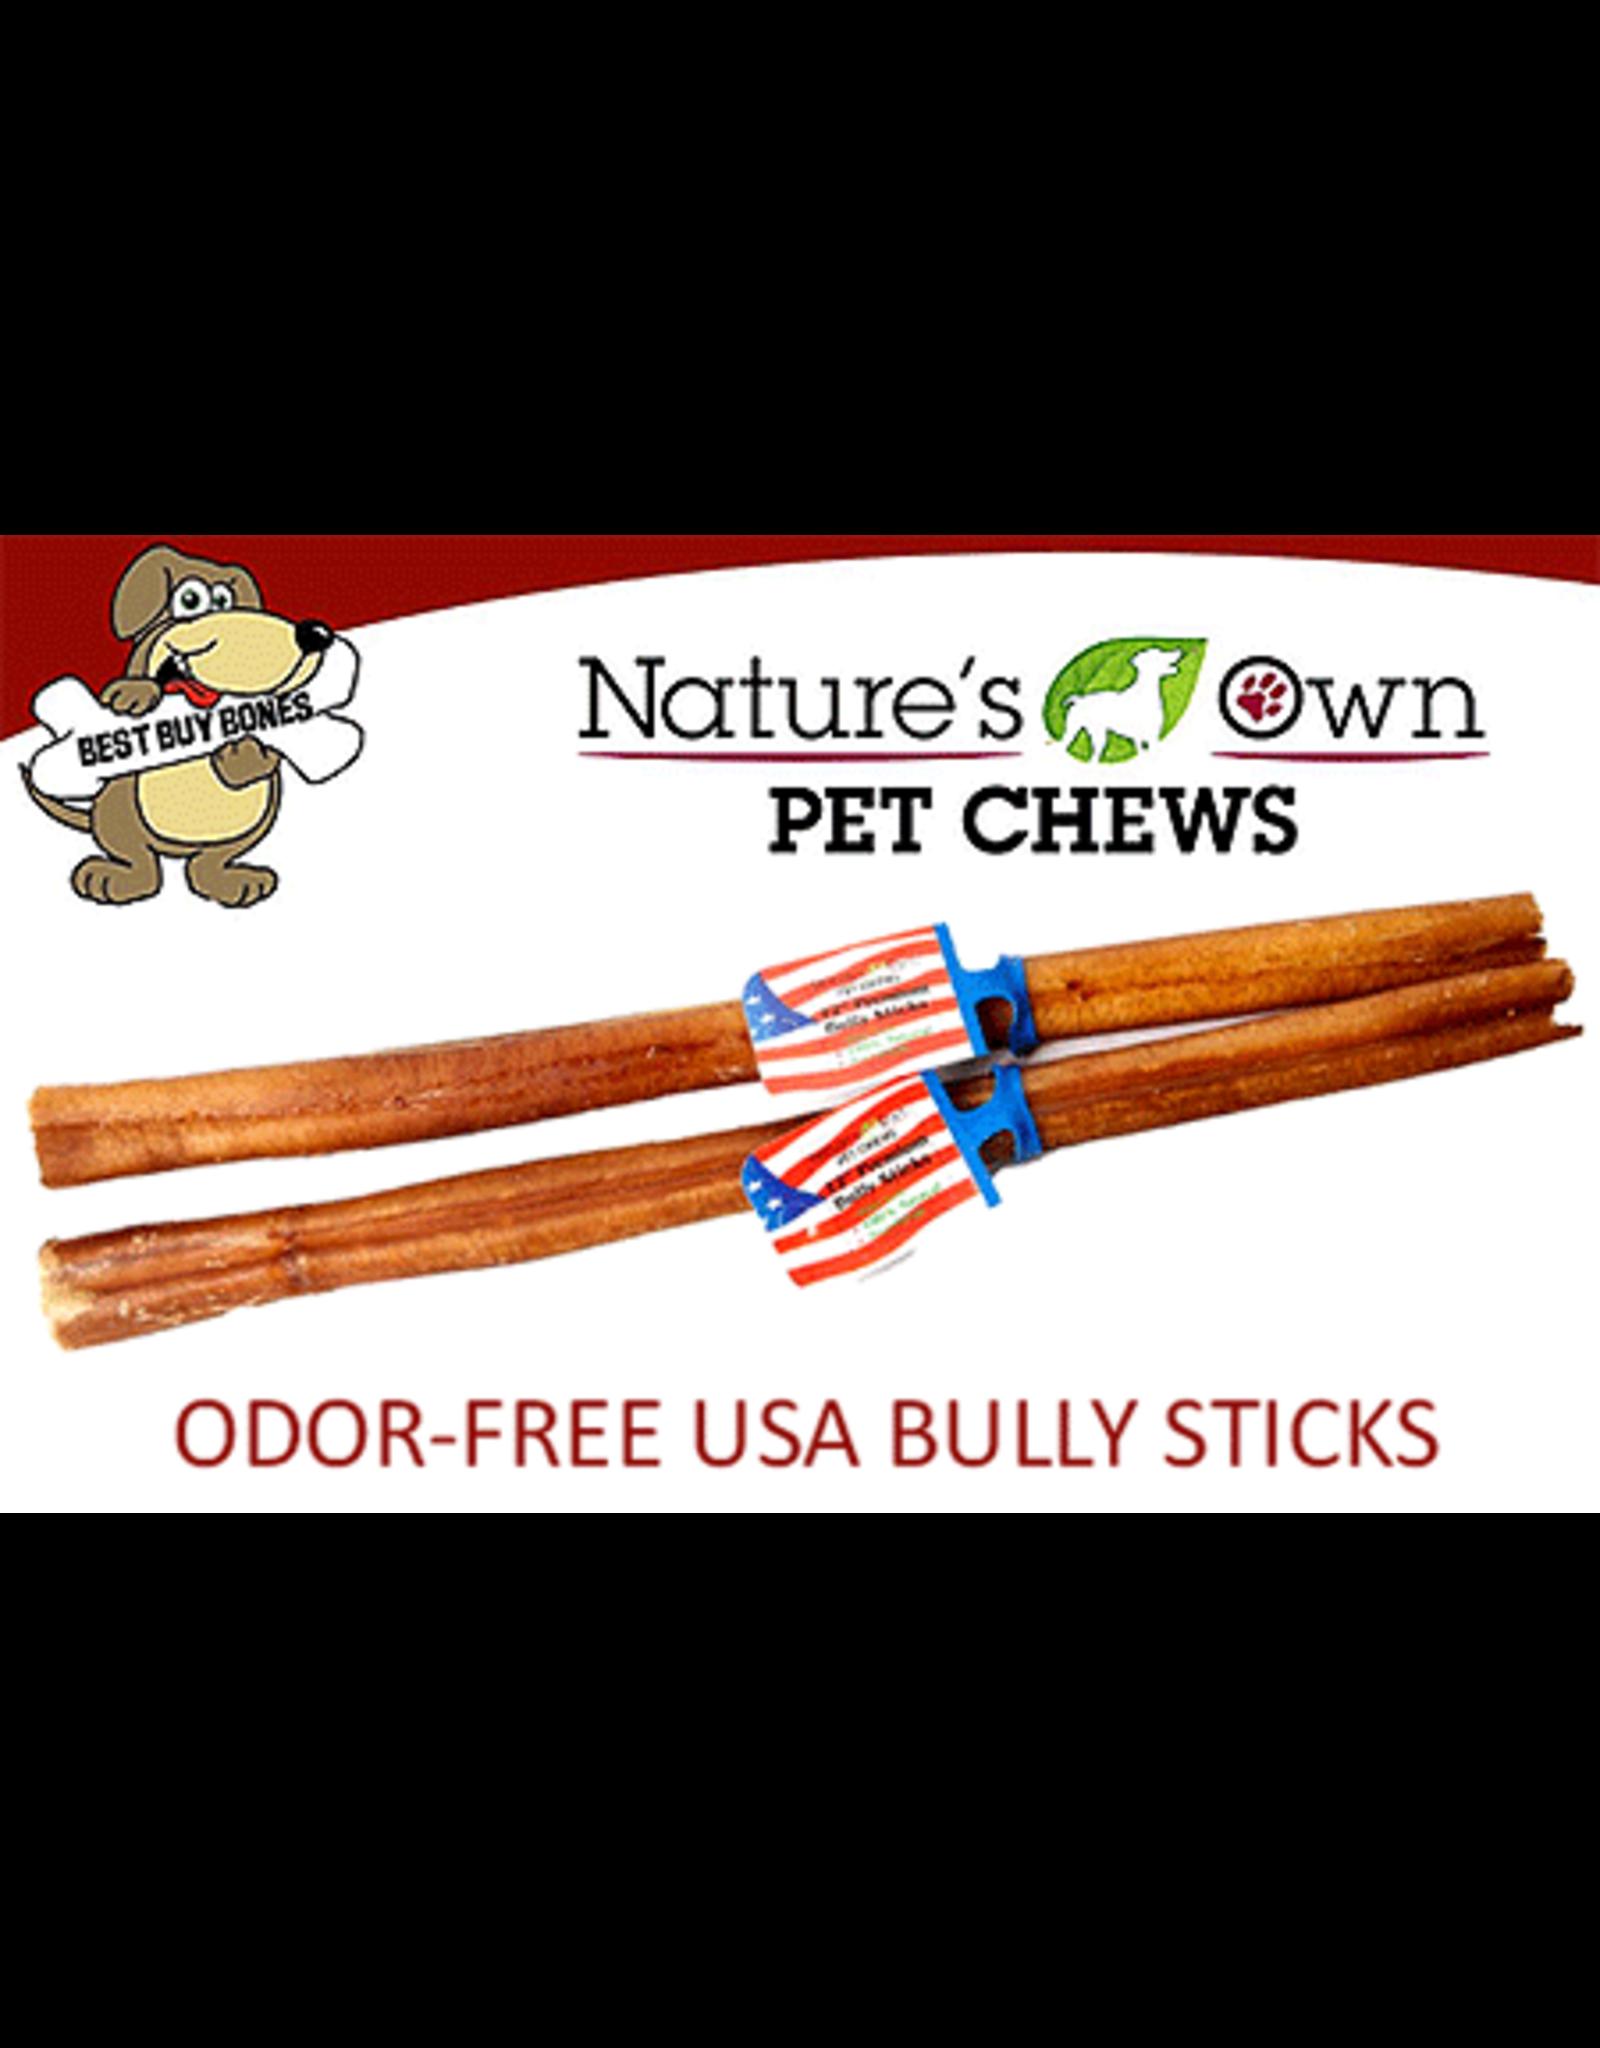 Best Buy Bones BEST BUY Premium Bully Stick 12in 25ct